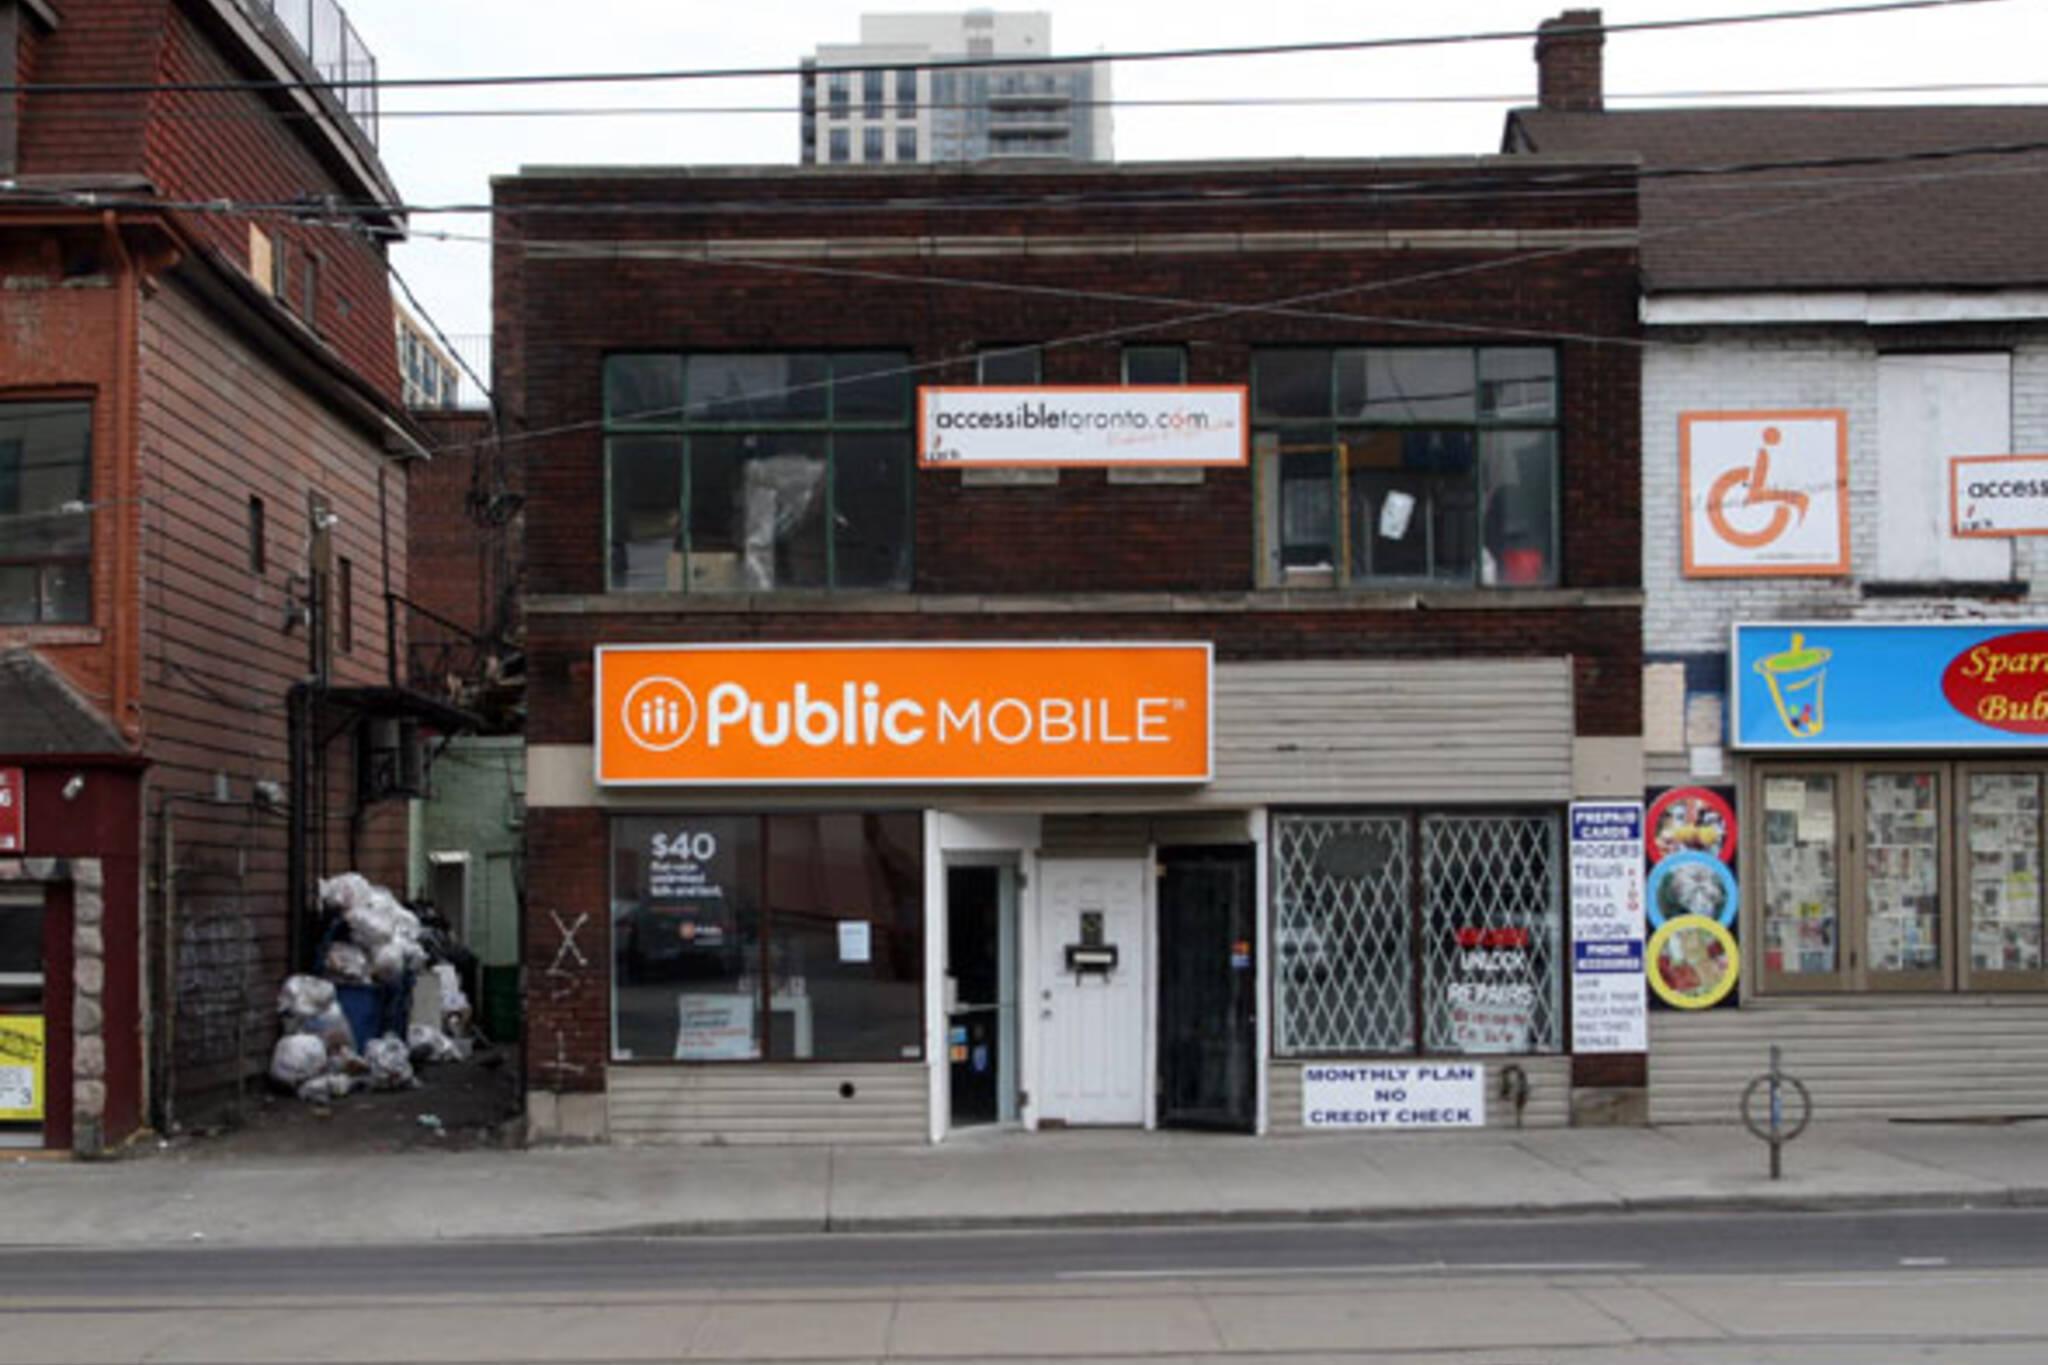 Public Mobile Wireless